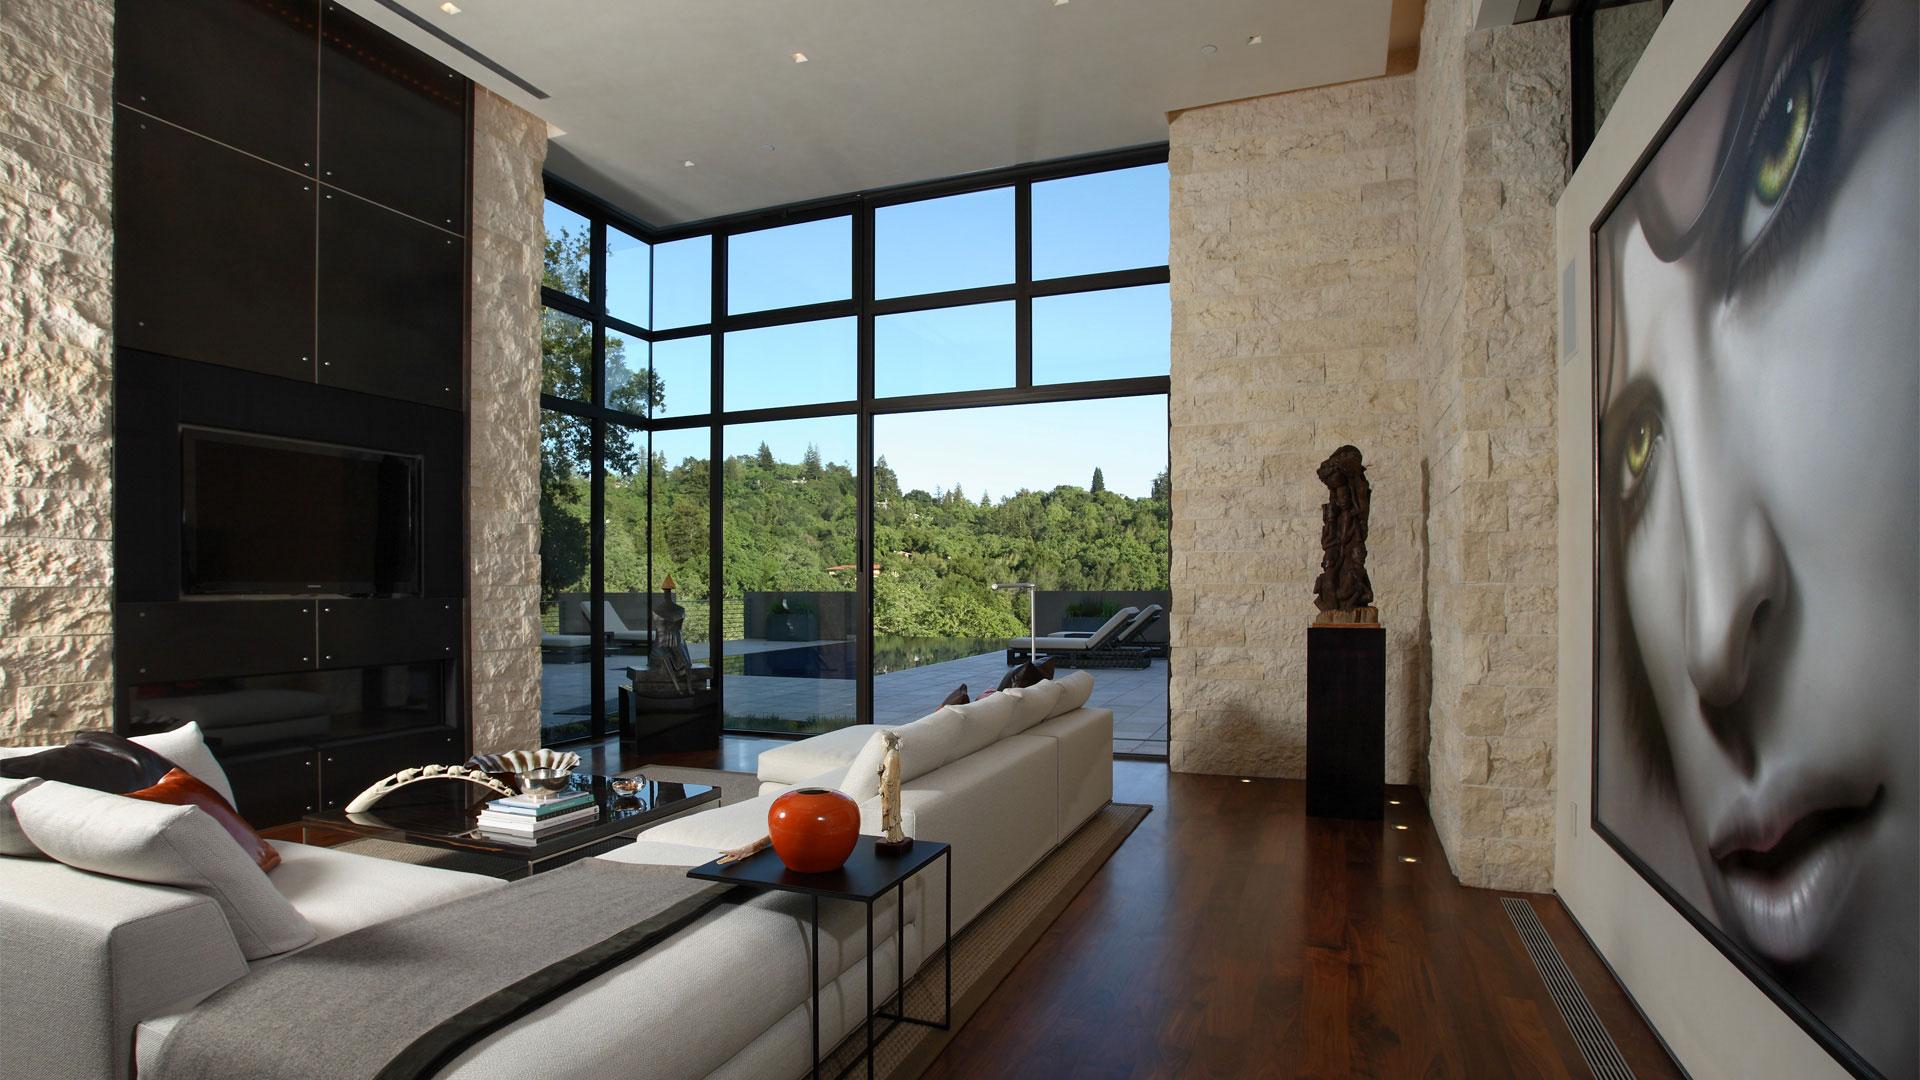 design fenster t ren amari de. Black Bedroom Furniture Sets. Home Design Ideas